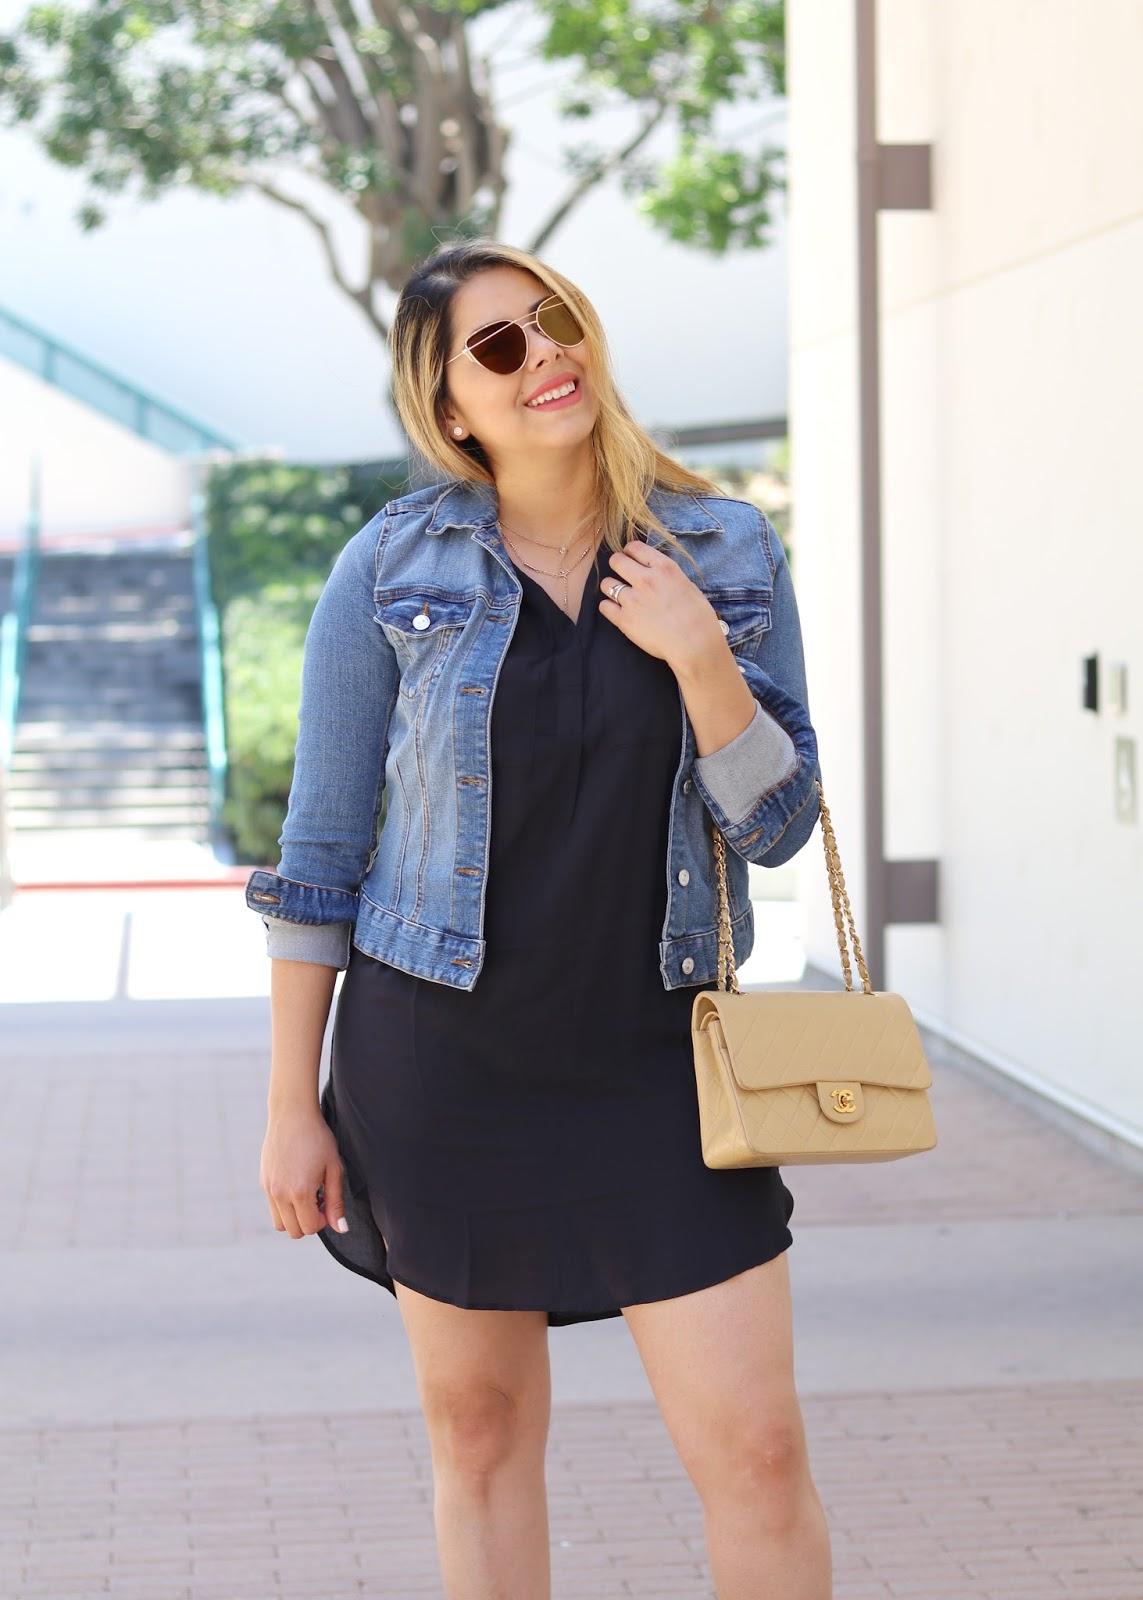 Black dress jean shirt - H M Outfit H M Black Shirtdress How To Wear A Black Shirtdress Summer 2016